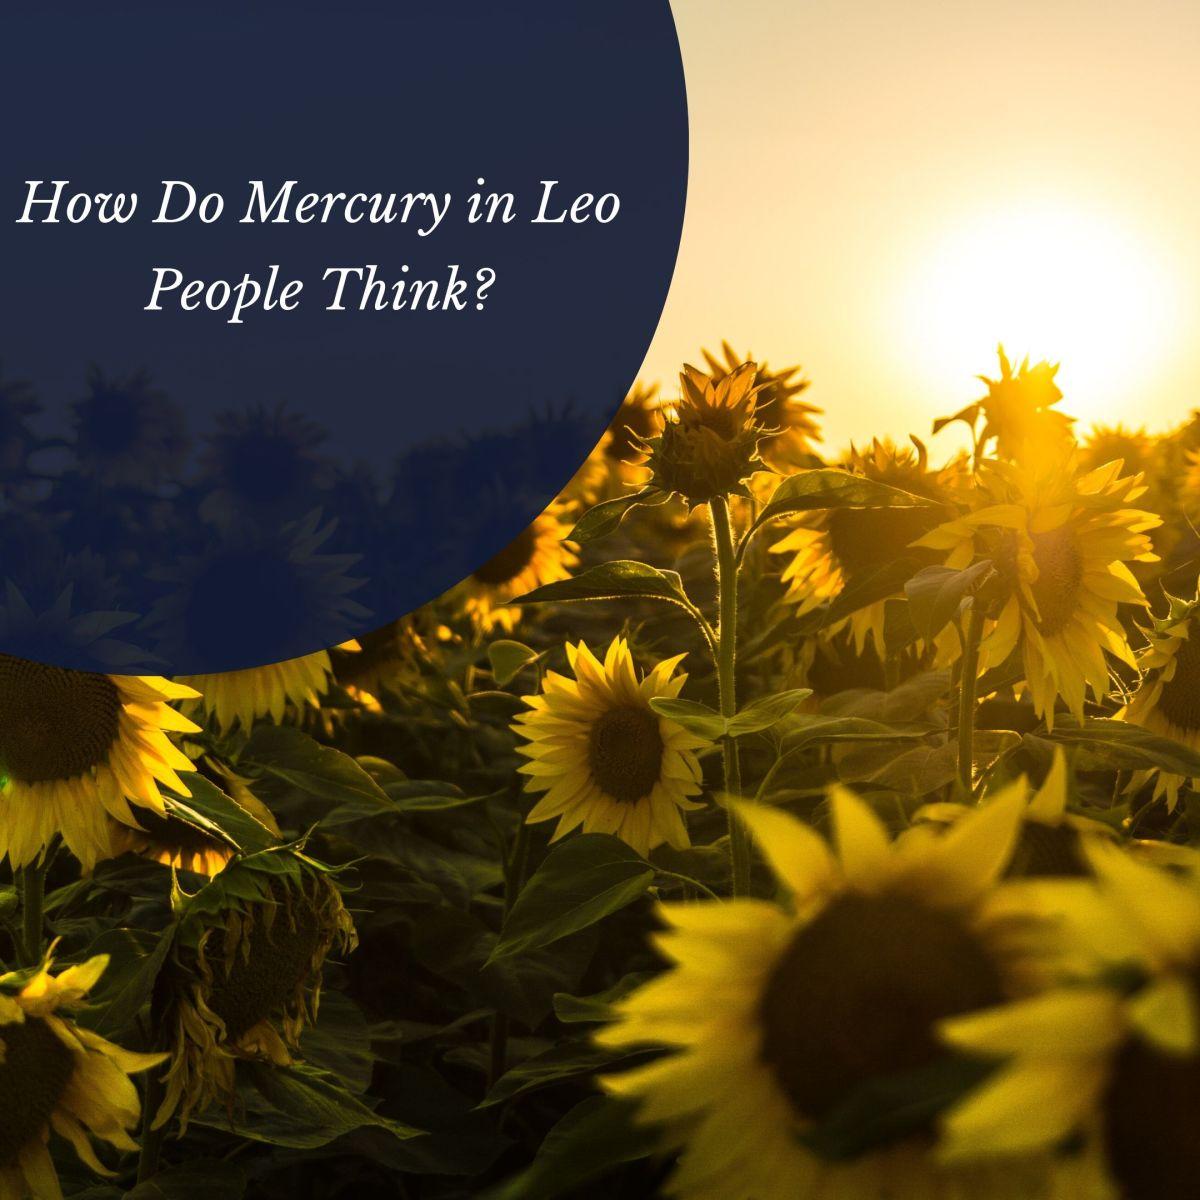 Mercury in Leo Thinkers